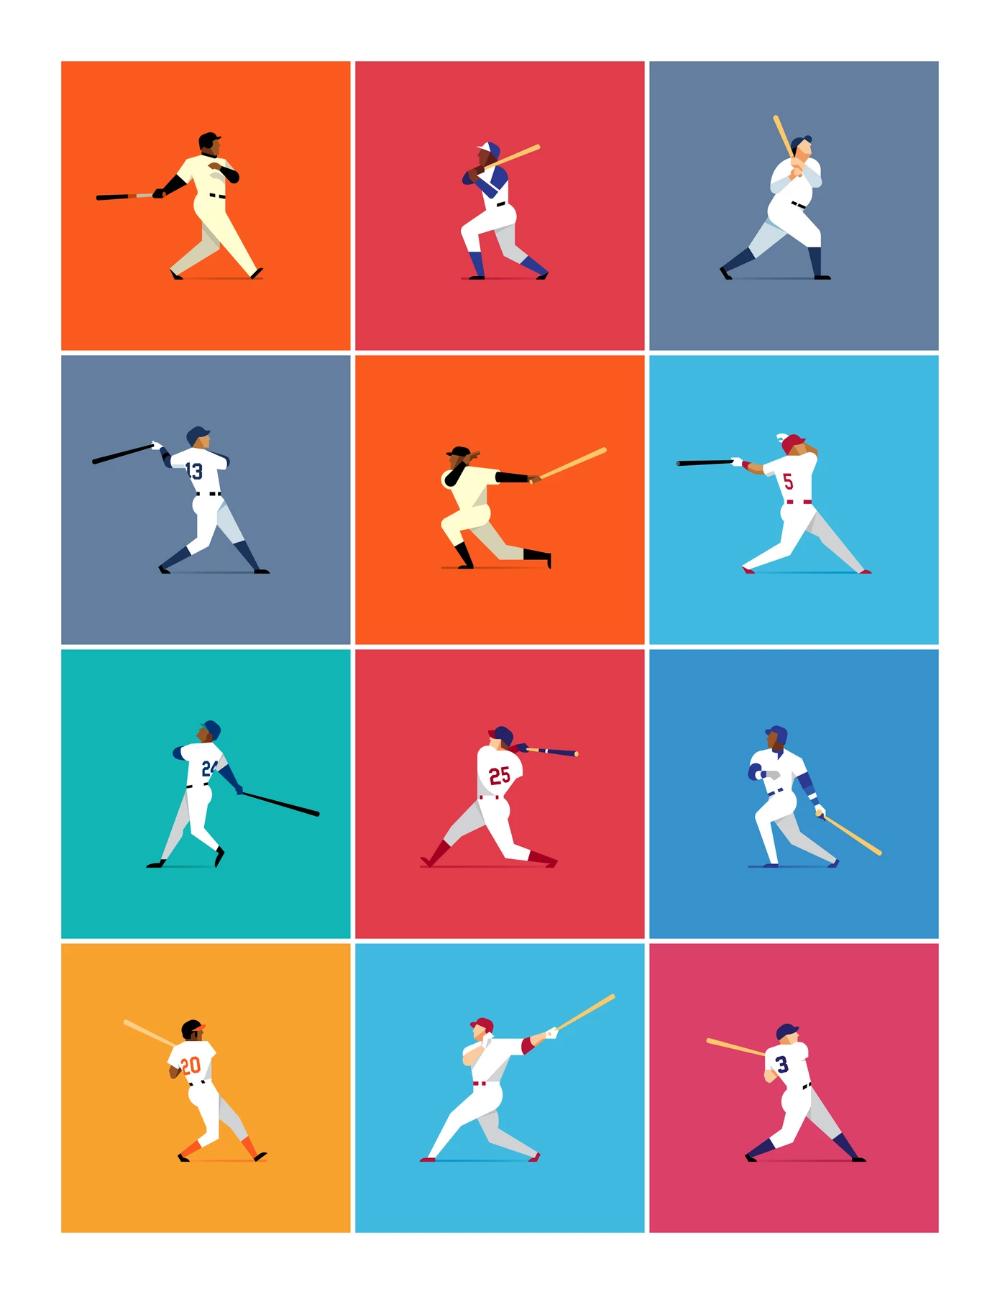 Home Run Kings Homerun Sport Illustration Giclee Print